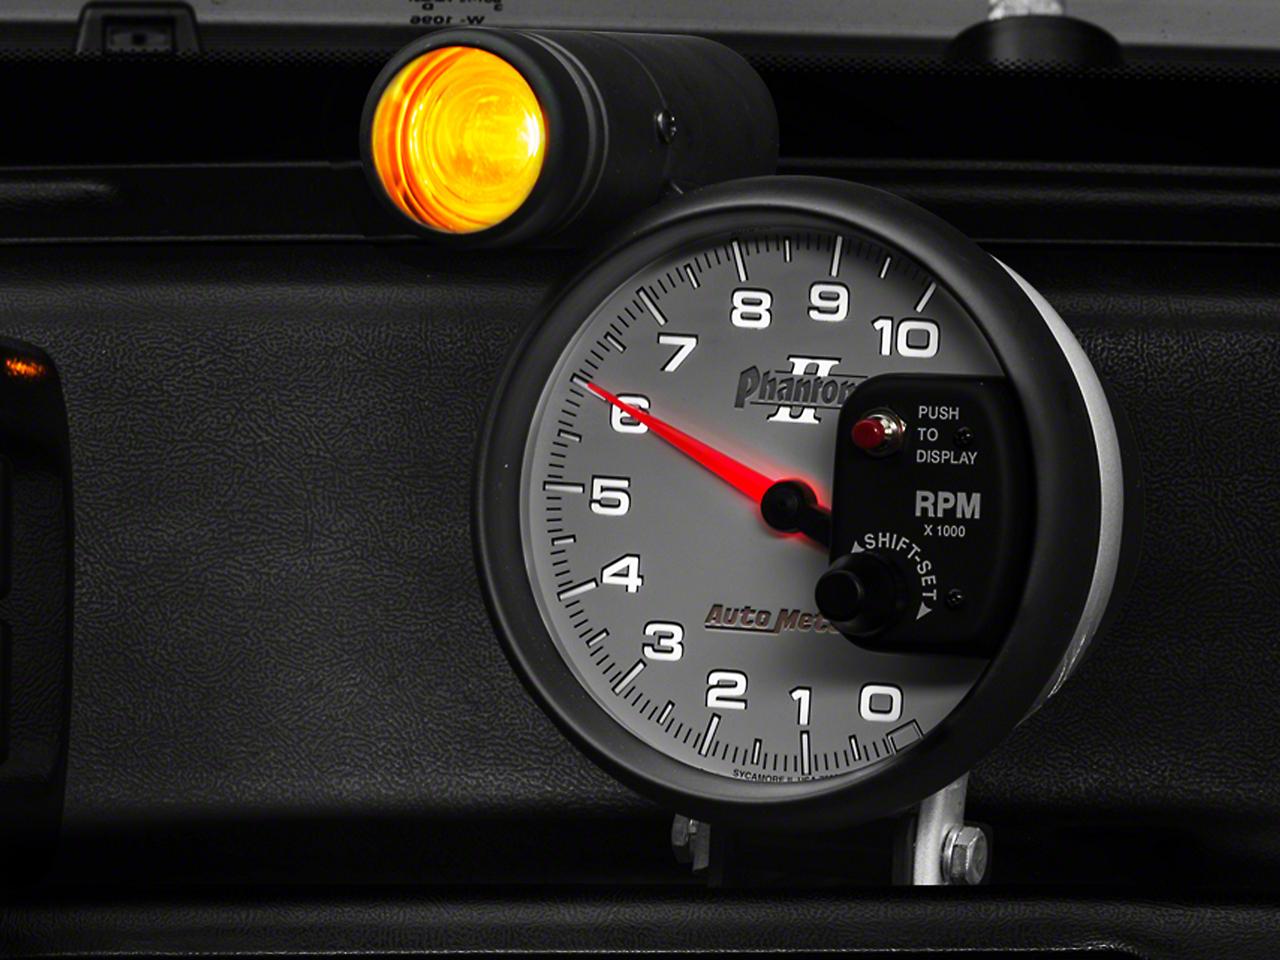 Auto Meter Phantom II 5 in. Tachometer w/ Shift Light (79-17 All)